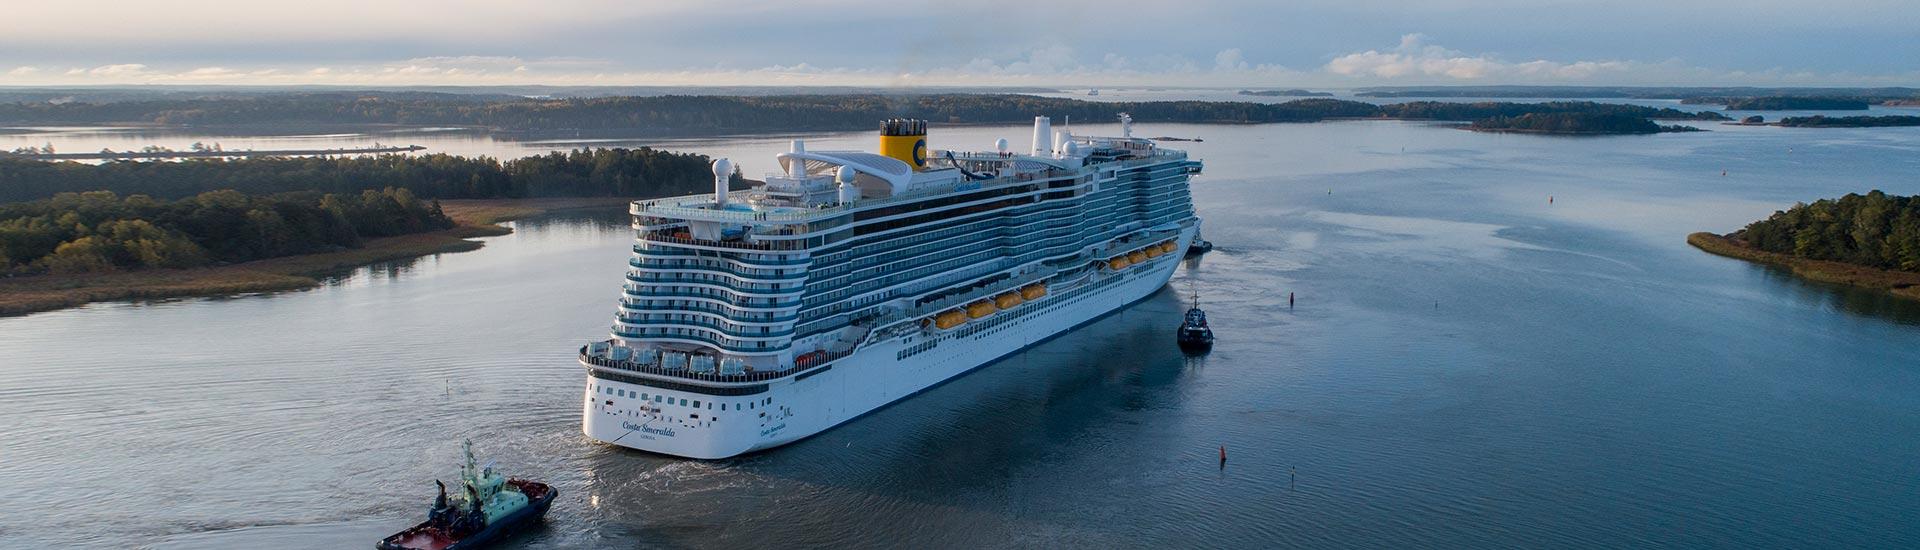 歌诗达邮轮 Costa cruises